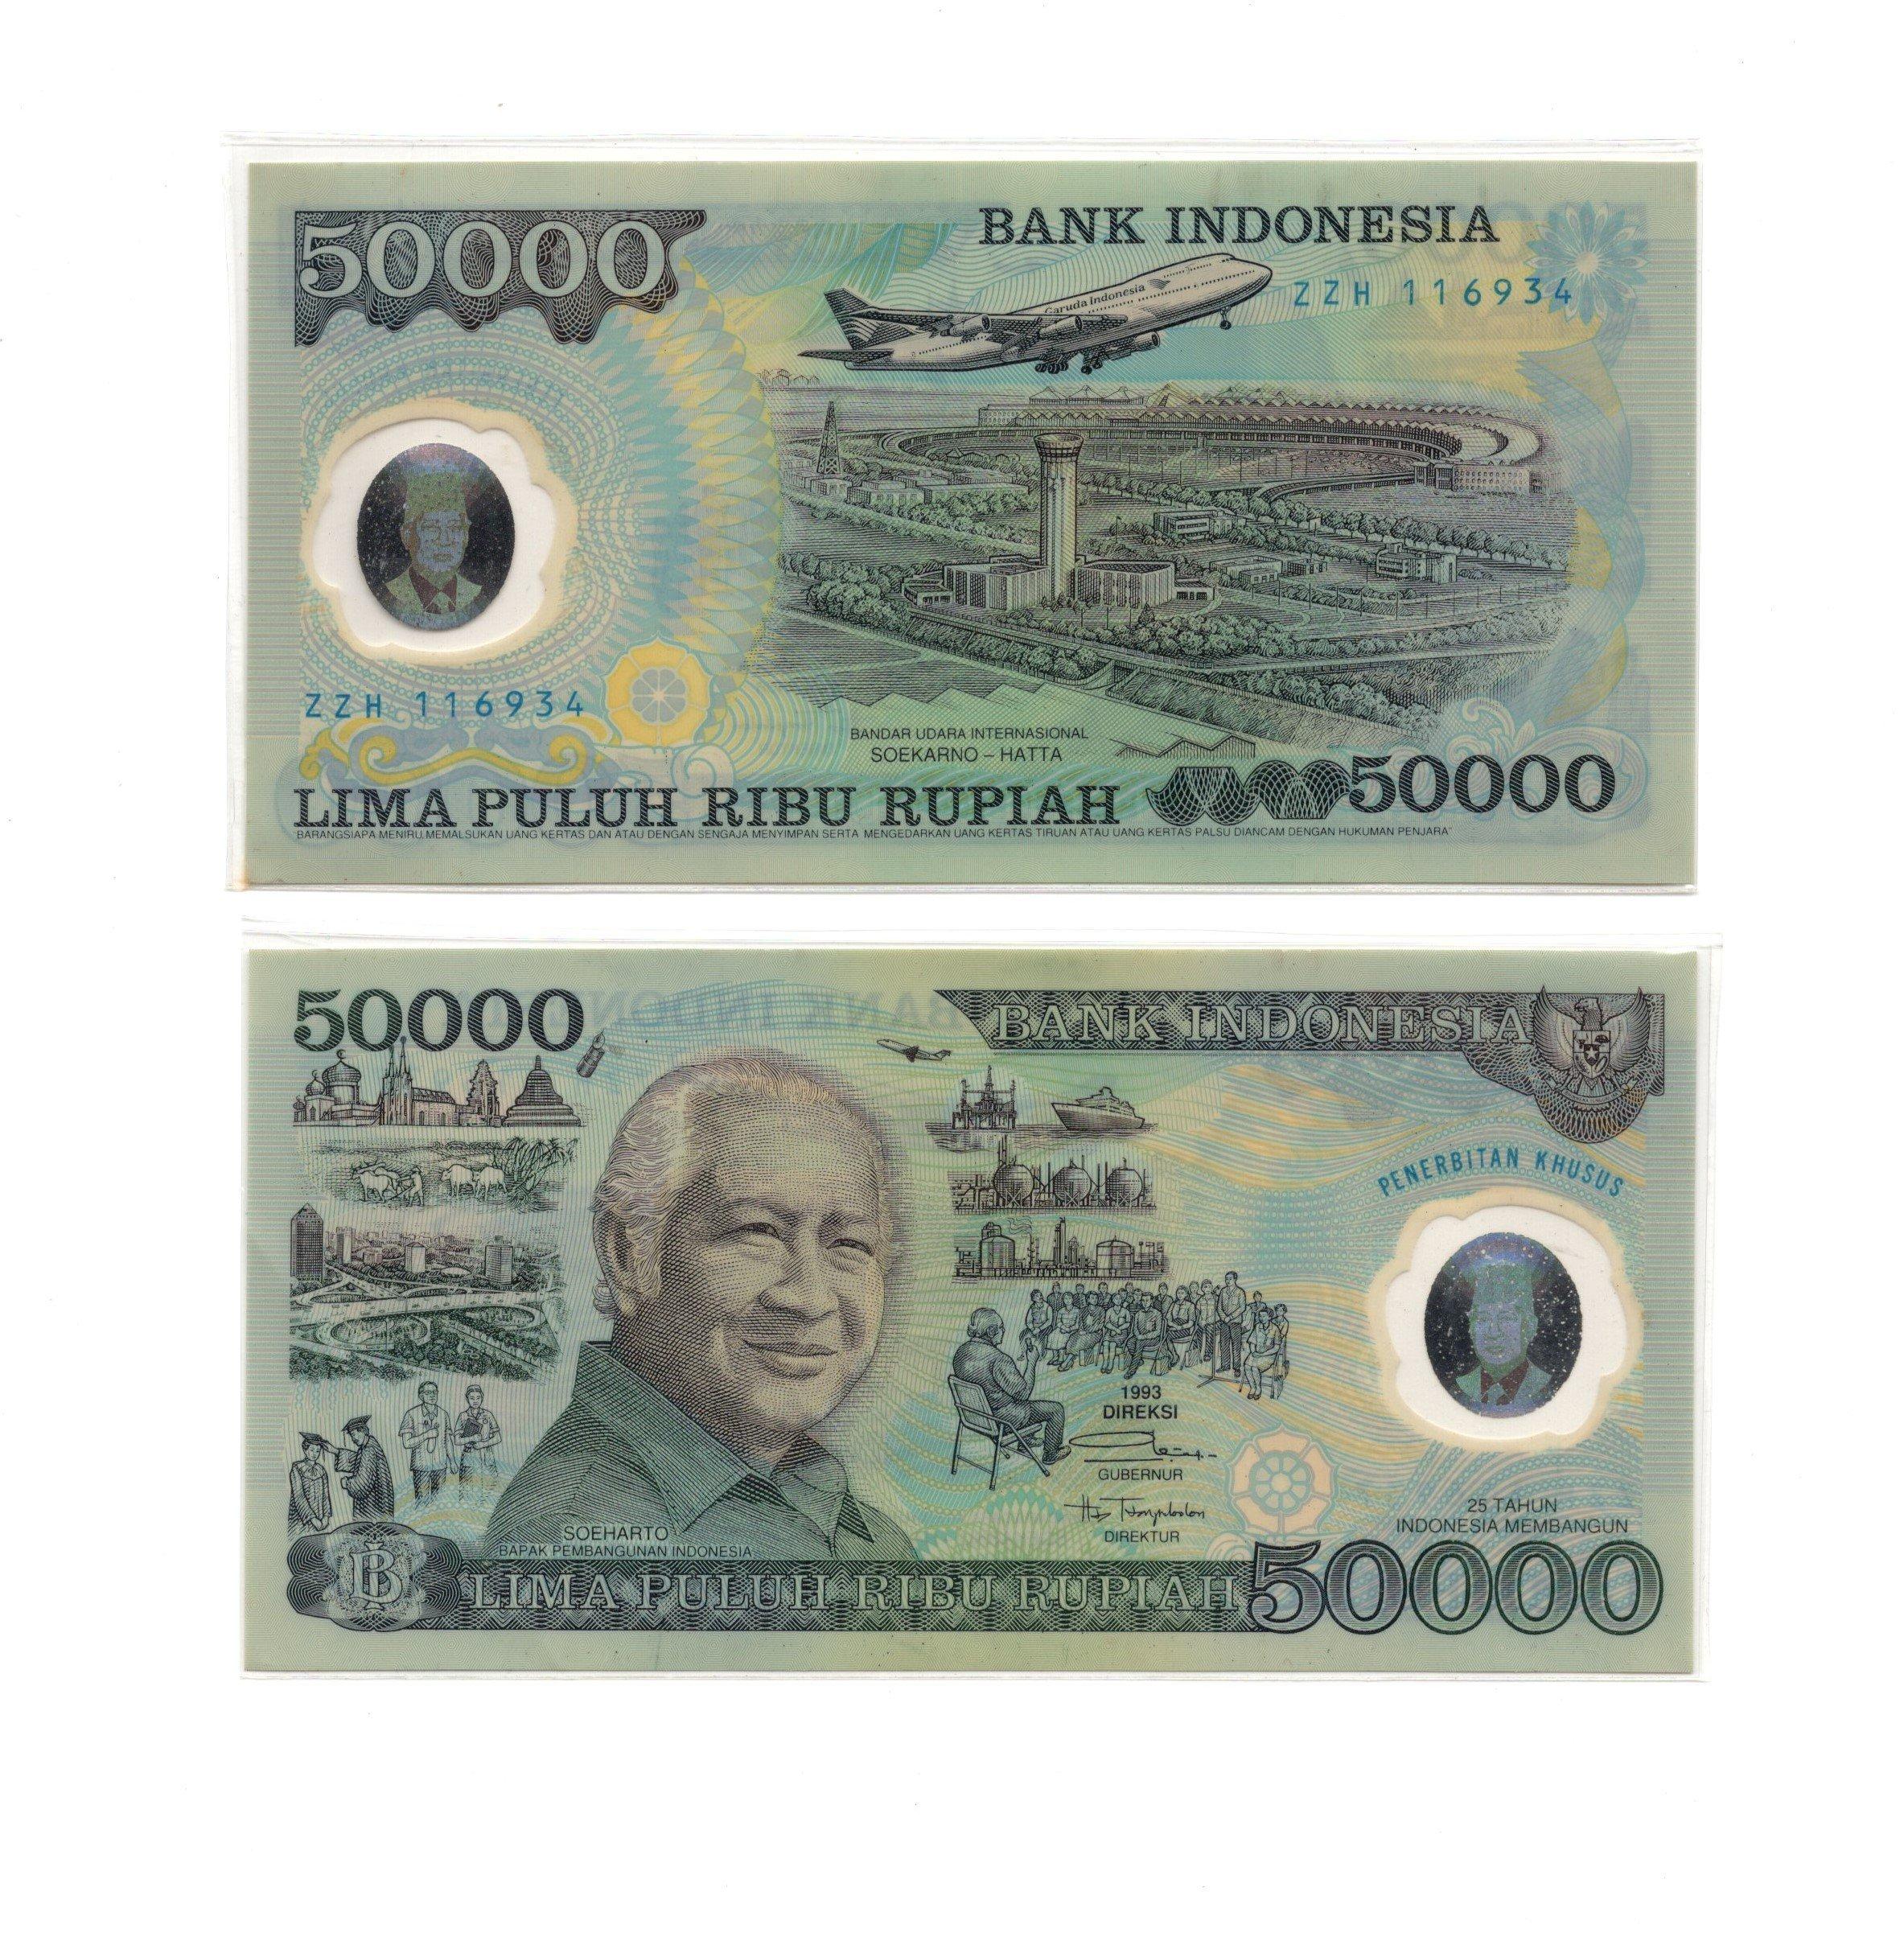 indonesia 50000 rupiah polymer